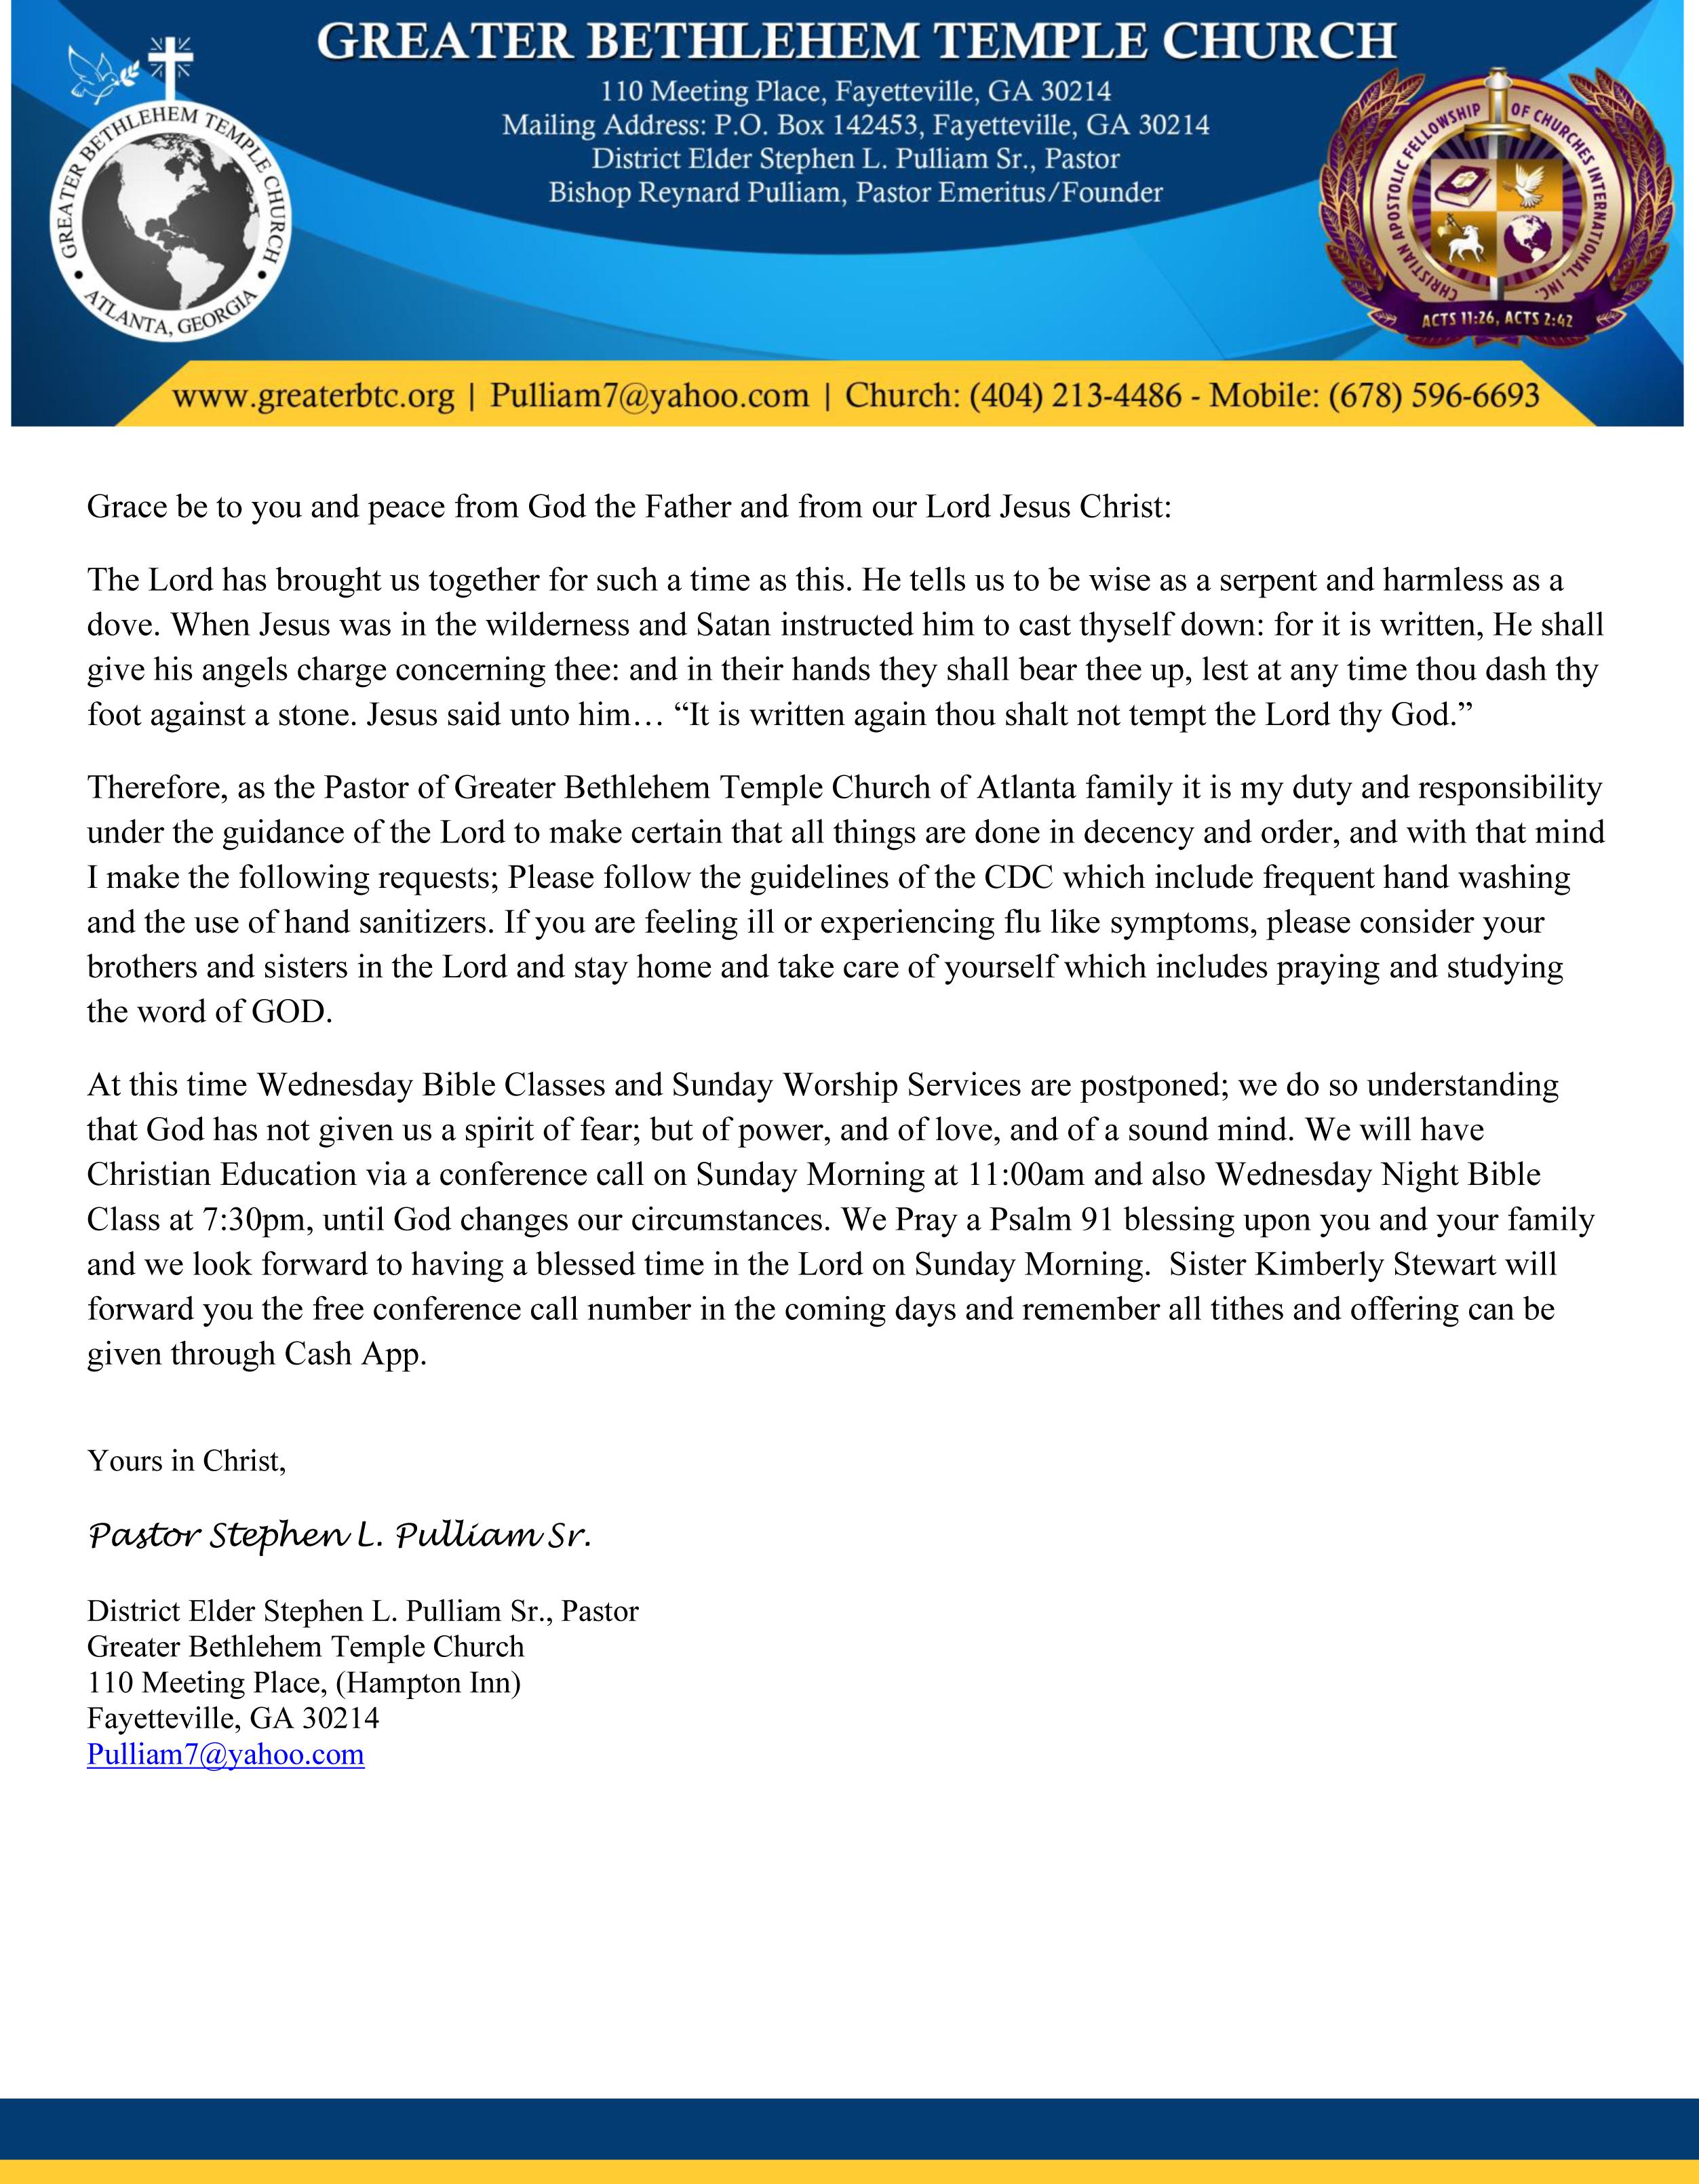 GBTCA March 18, 2020 Letter